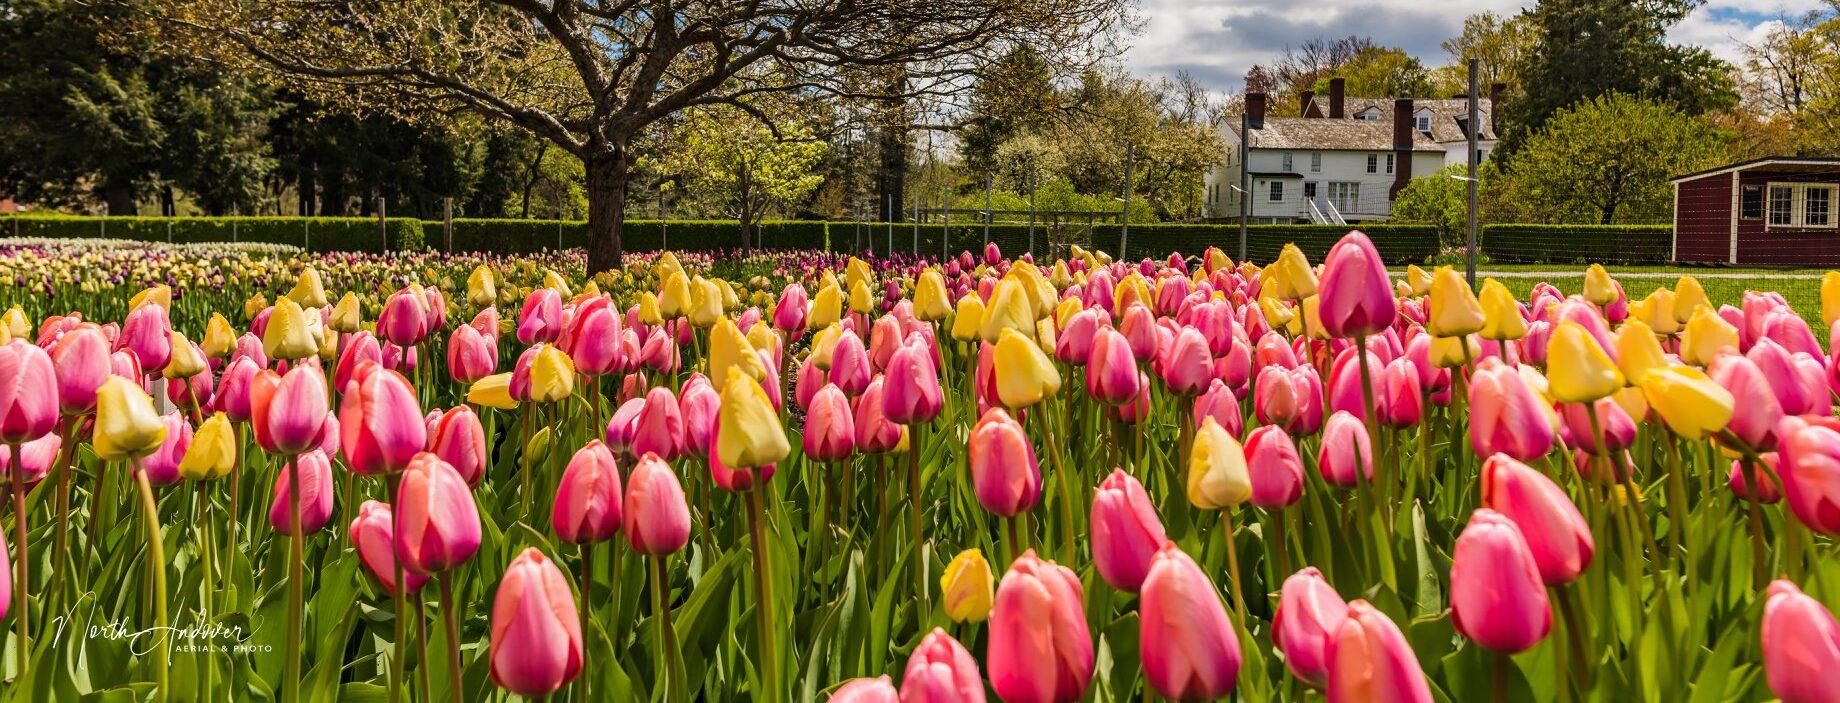 tulips at Stevens-Coolidge